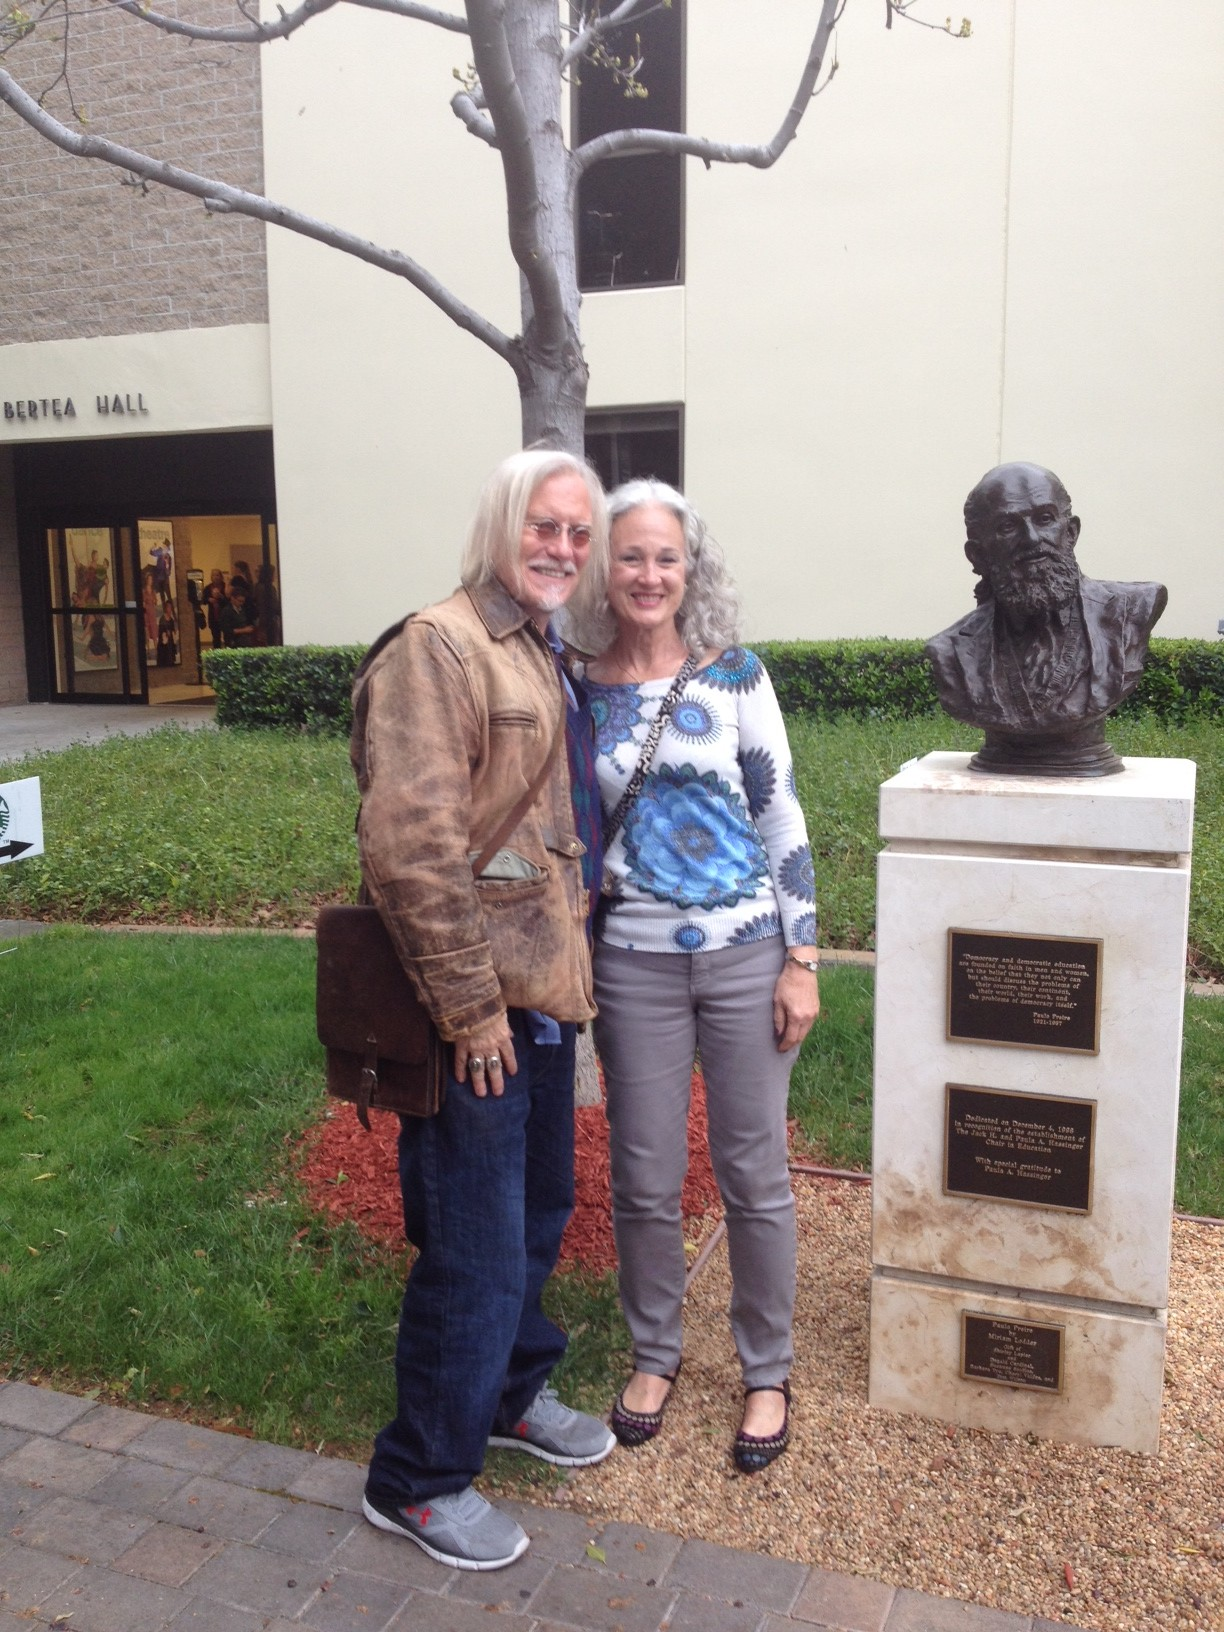 Peter and Christine Sleeter